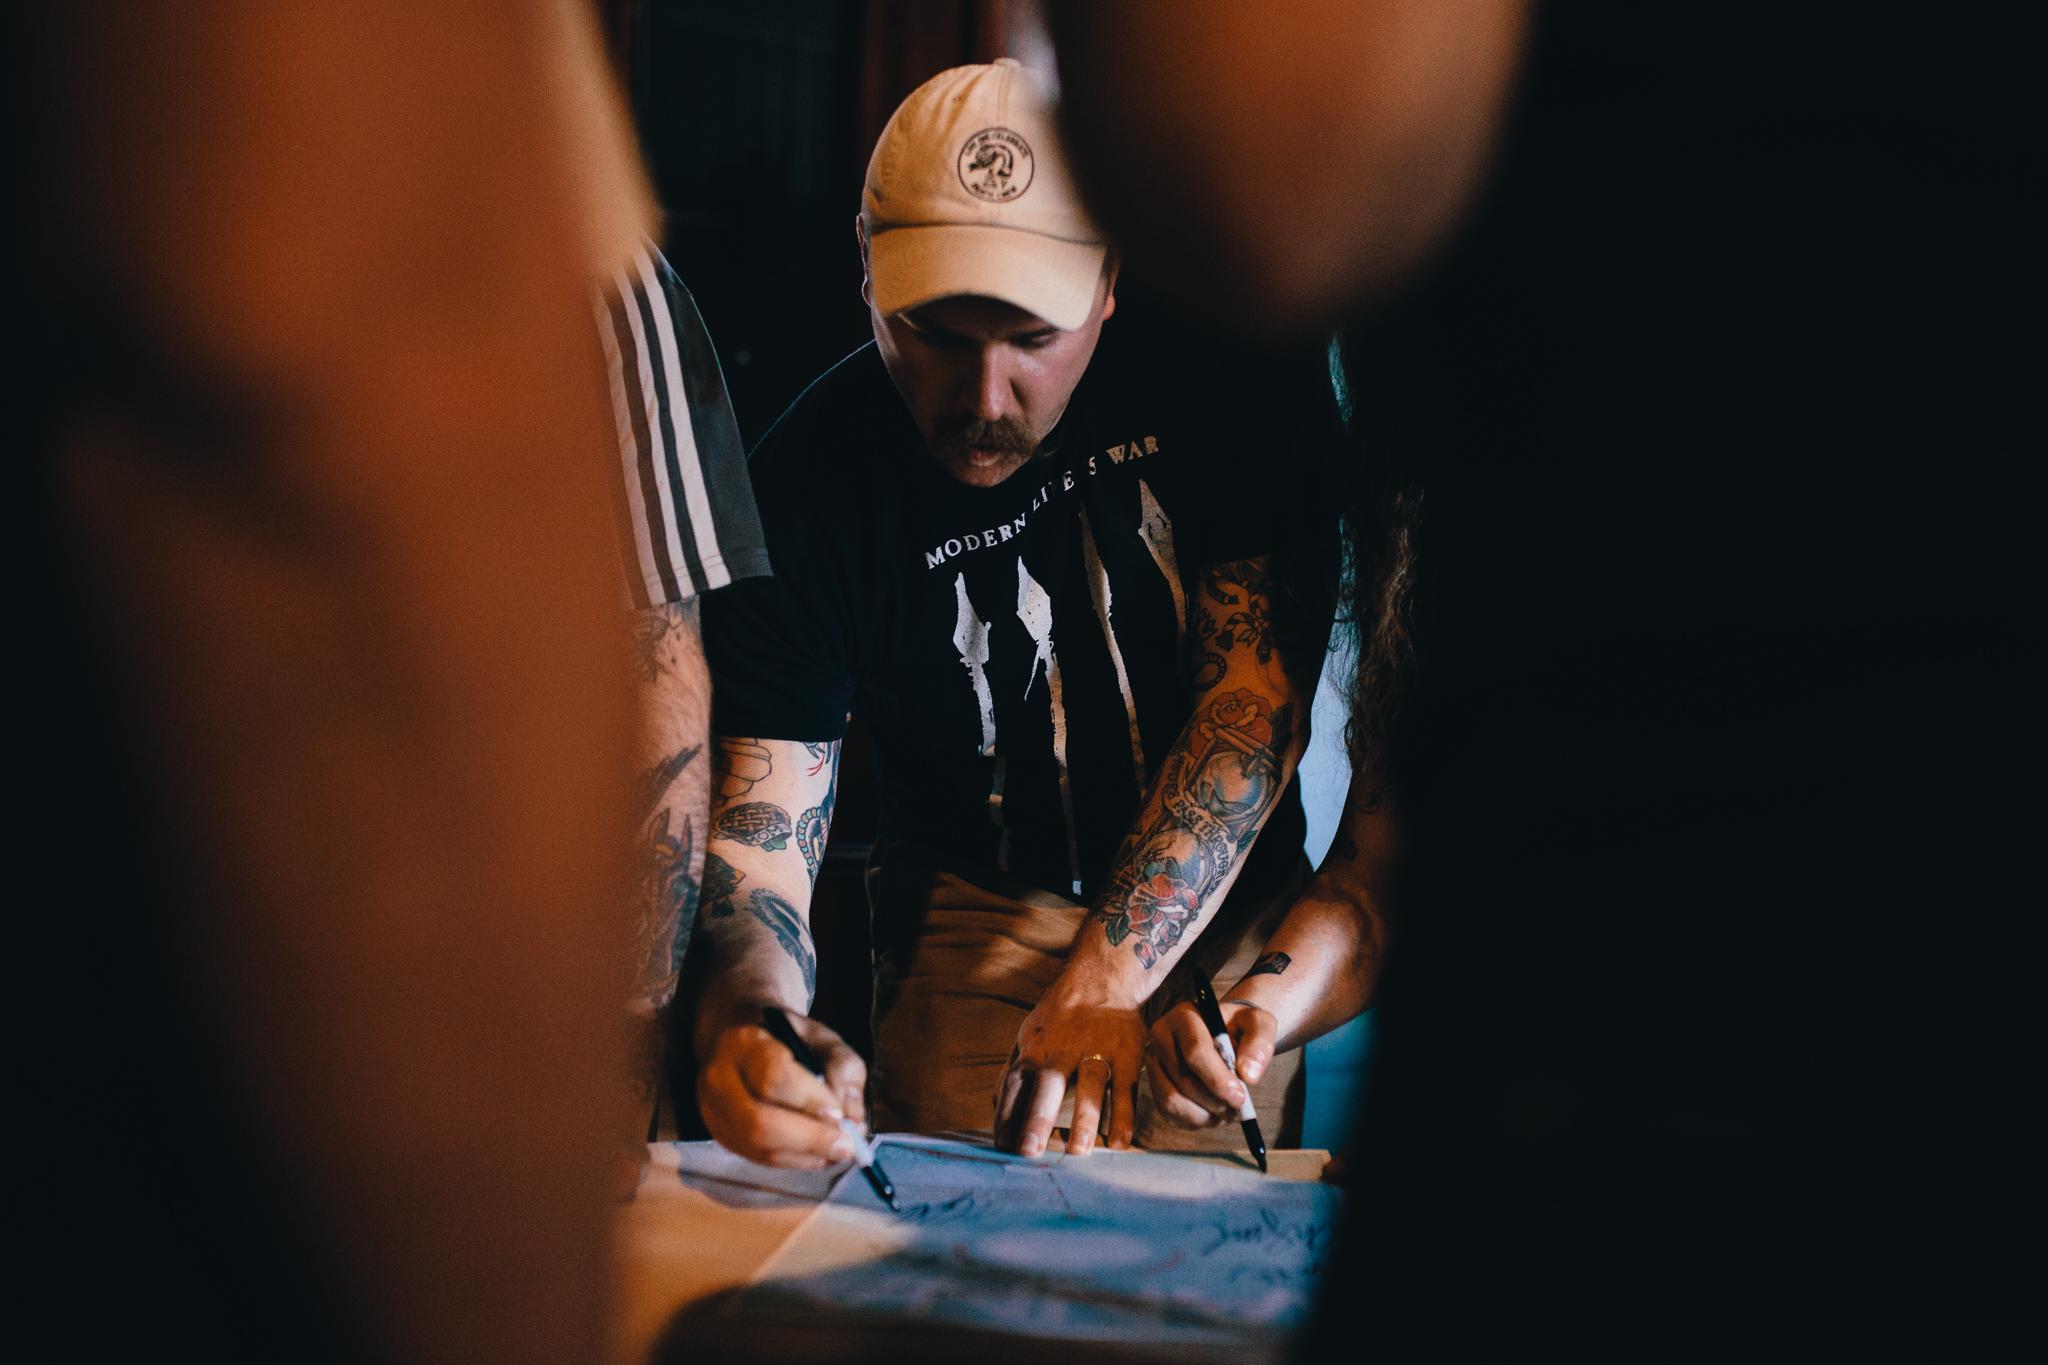 Shawn signing a T shirt